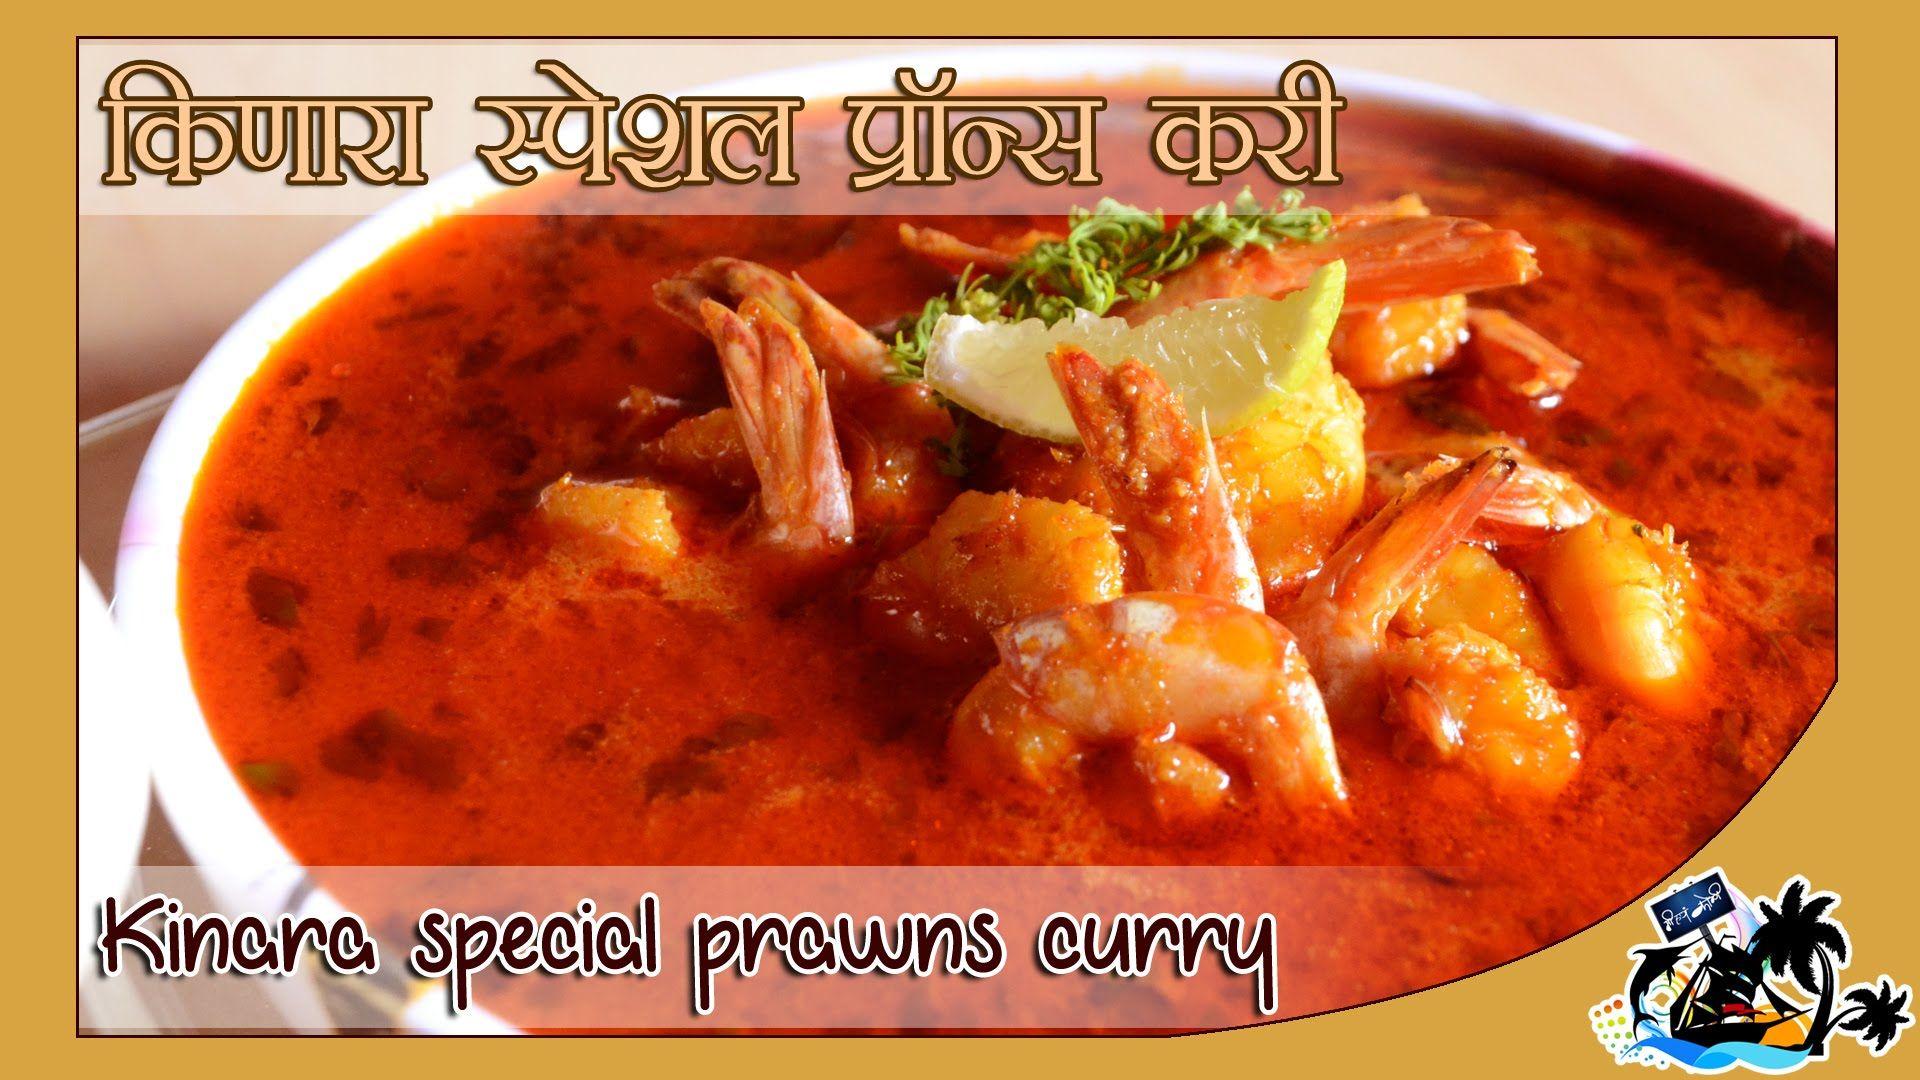 Prawns Curry | Kinnara Special | Authentic Seafood Recipe | My kind